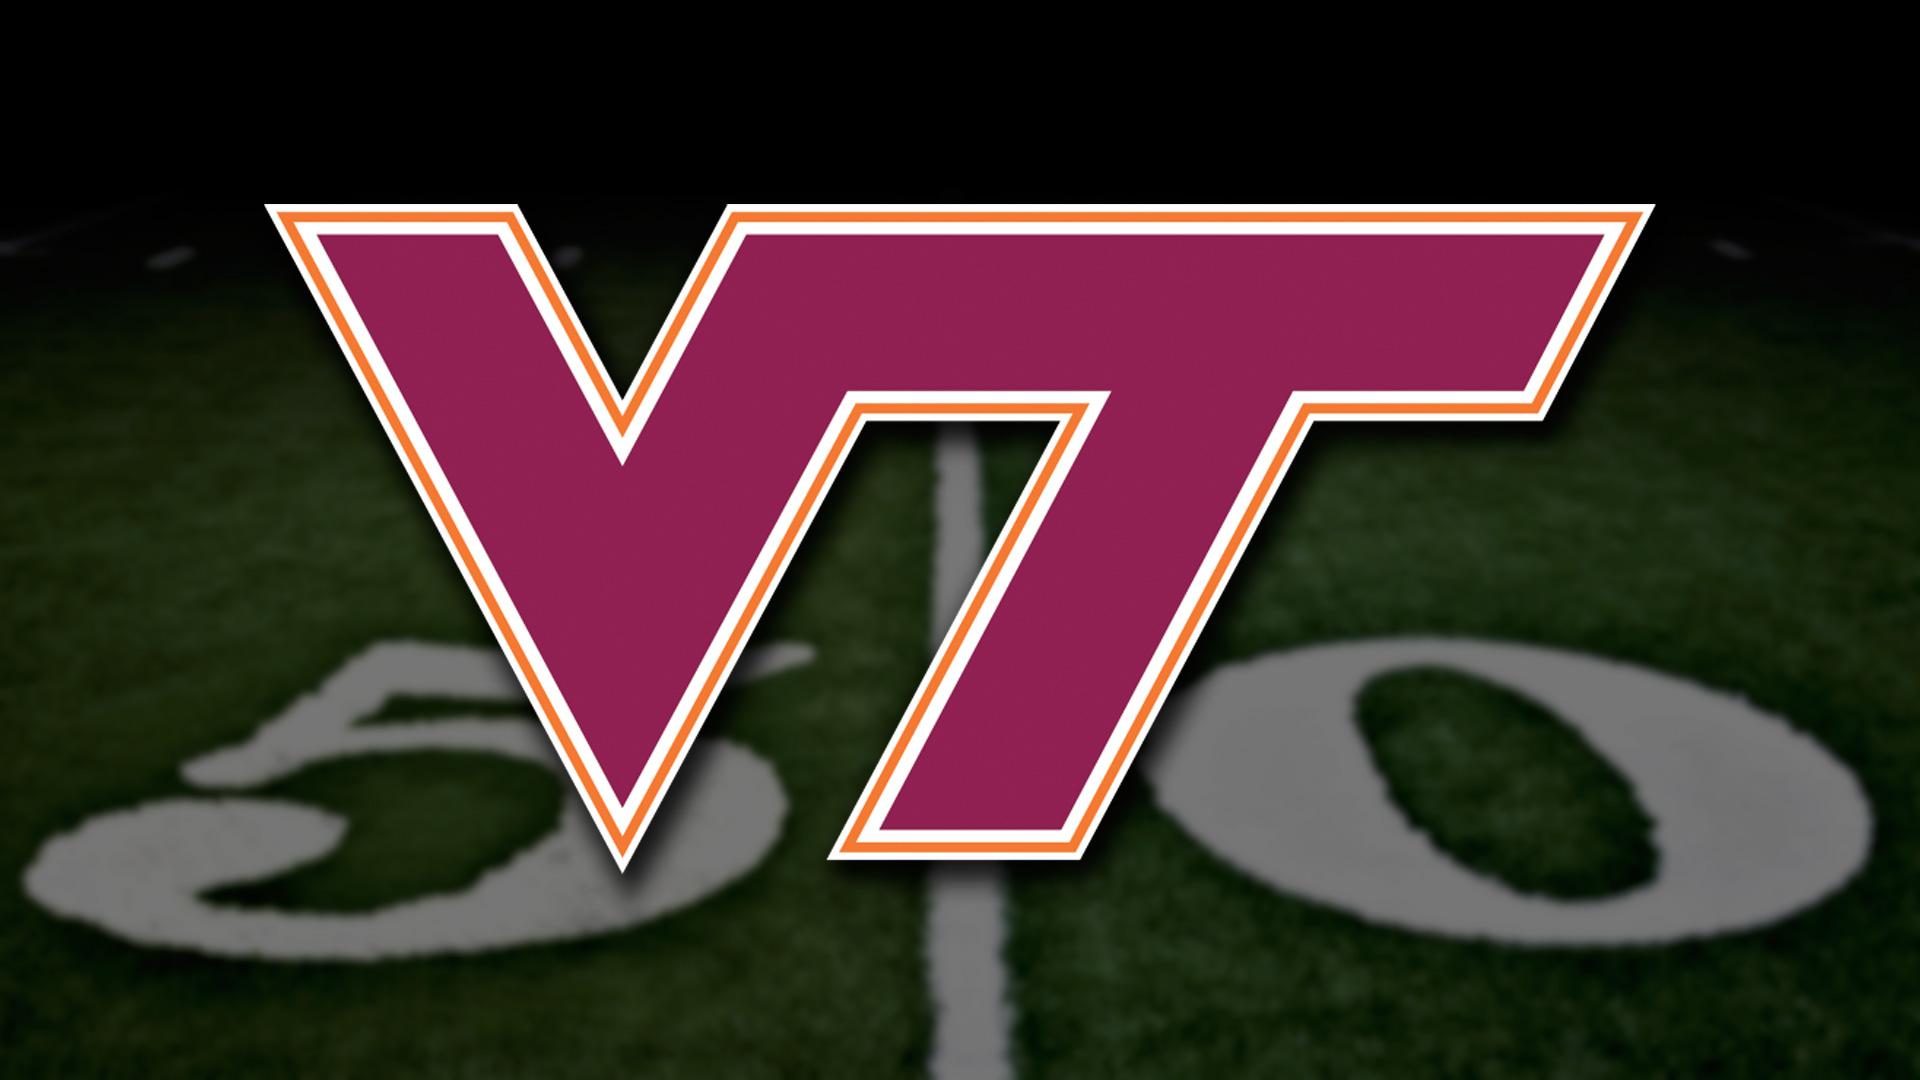 Galen Scott Resigns From the Virginia Tech Coaching Staff